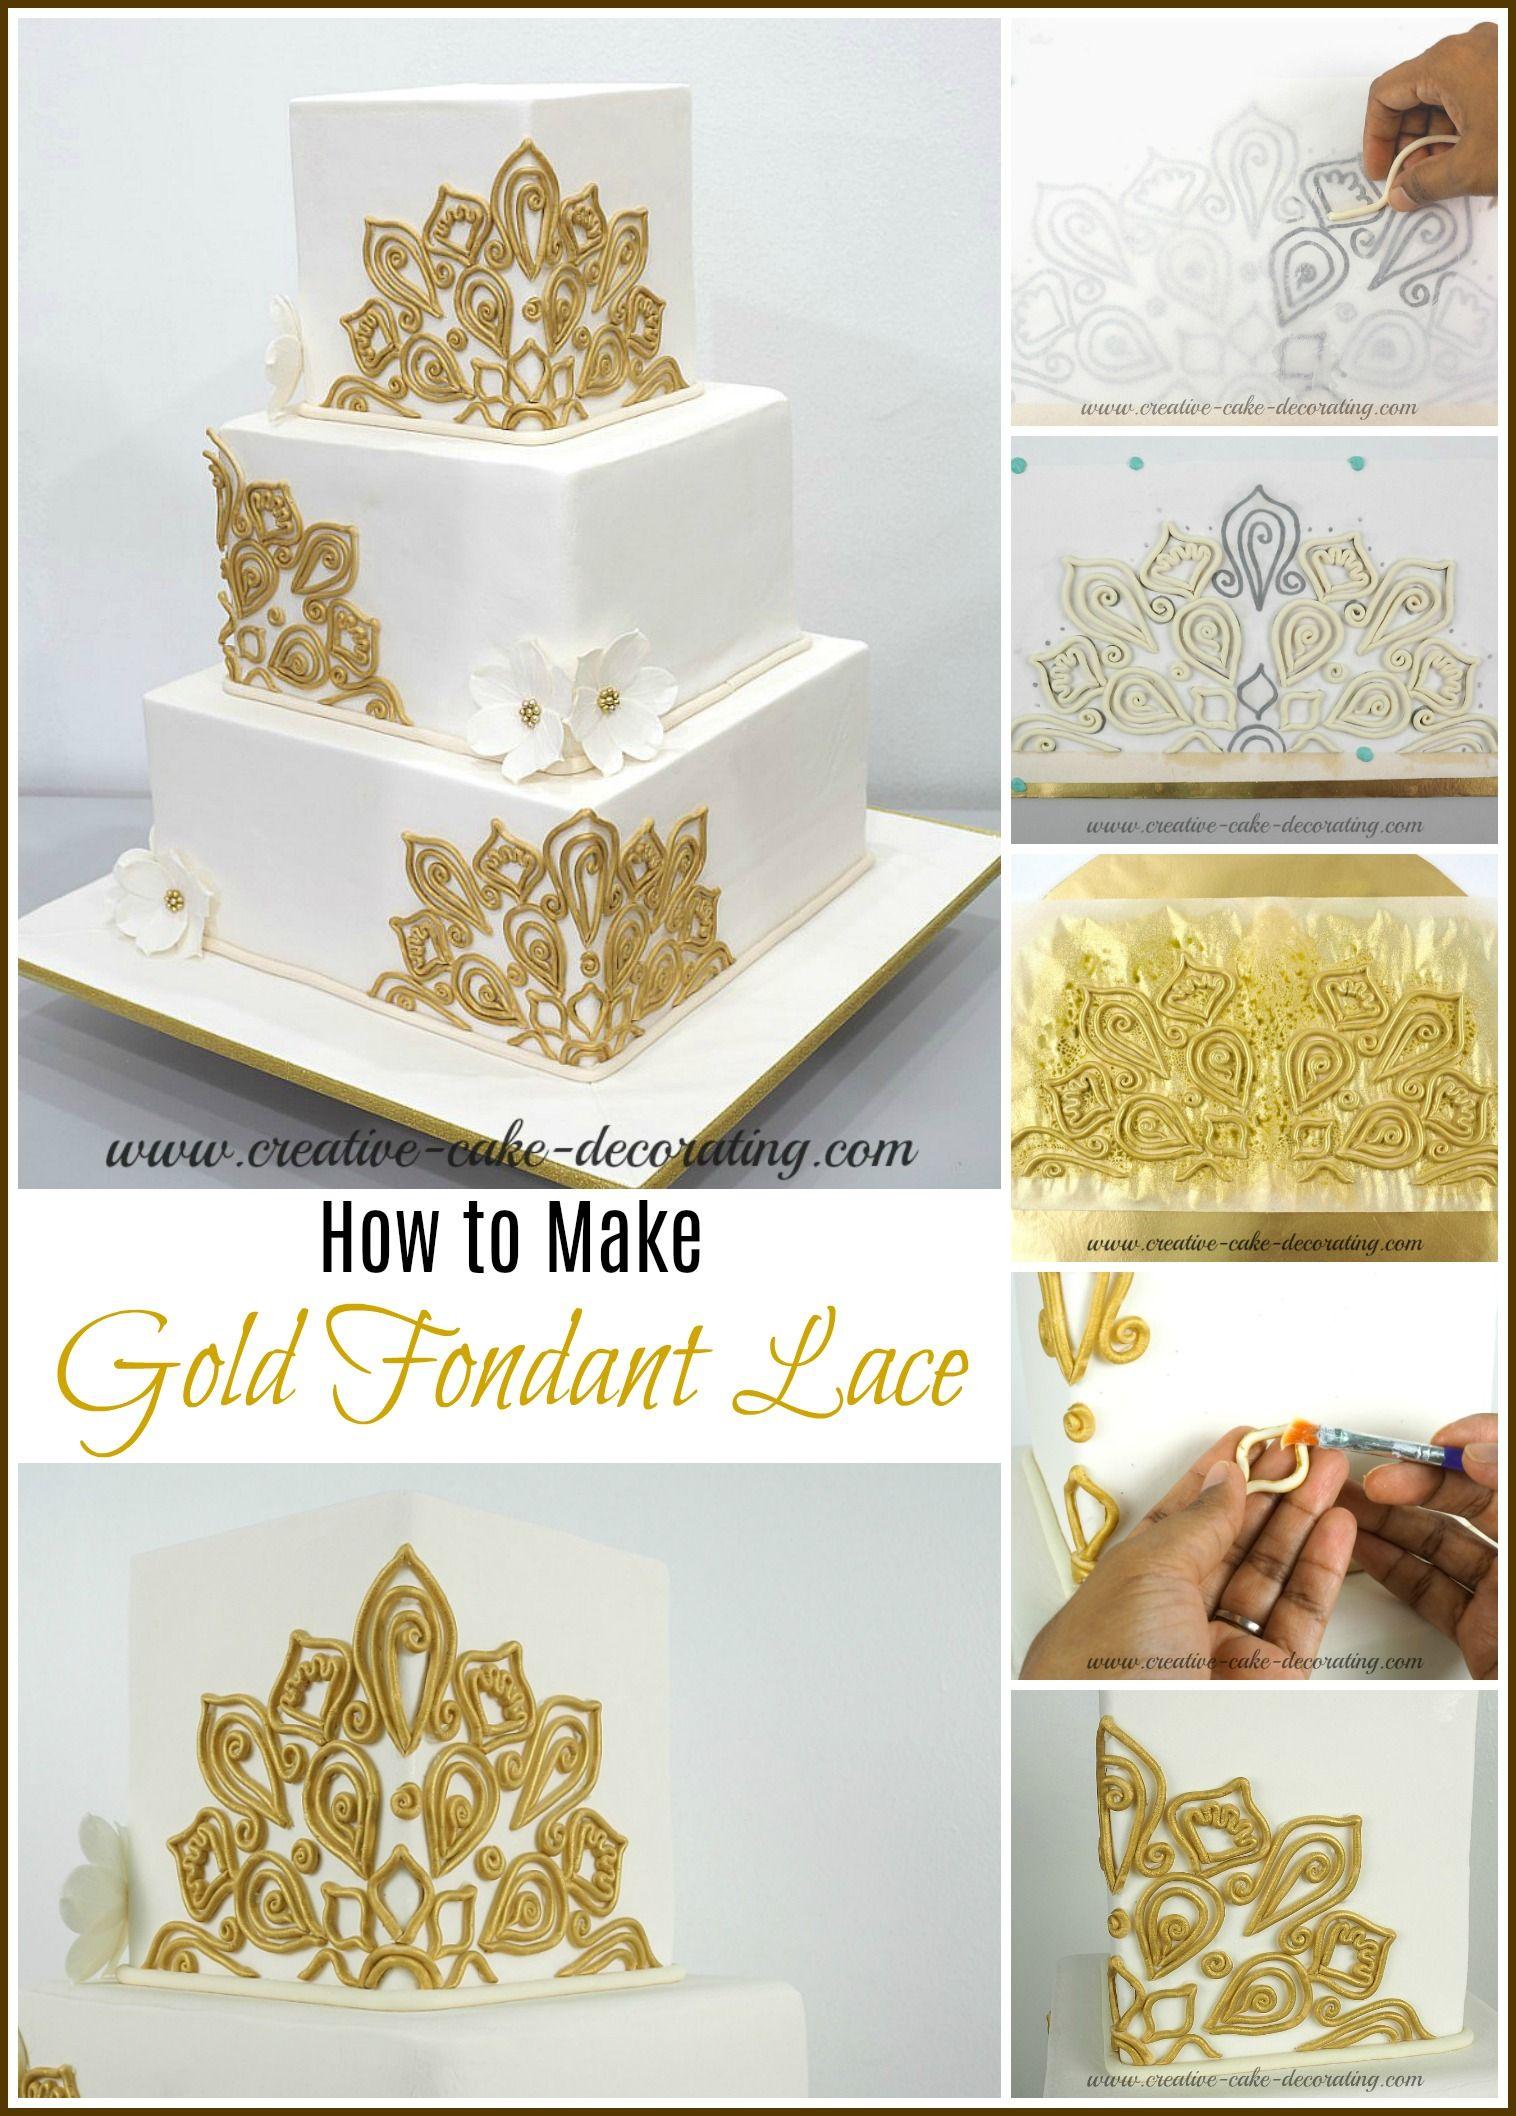 Square Wedding Cake | Cake Decorating Ideas | Pinterest | Square ...